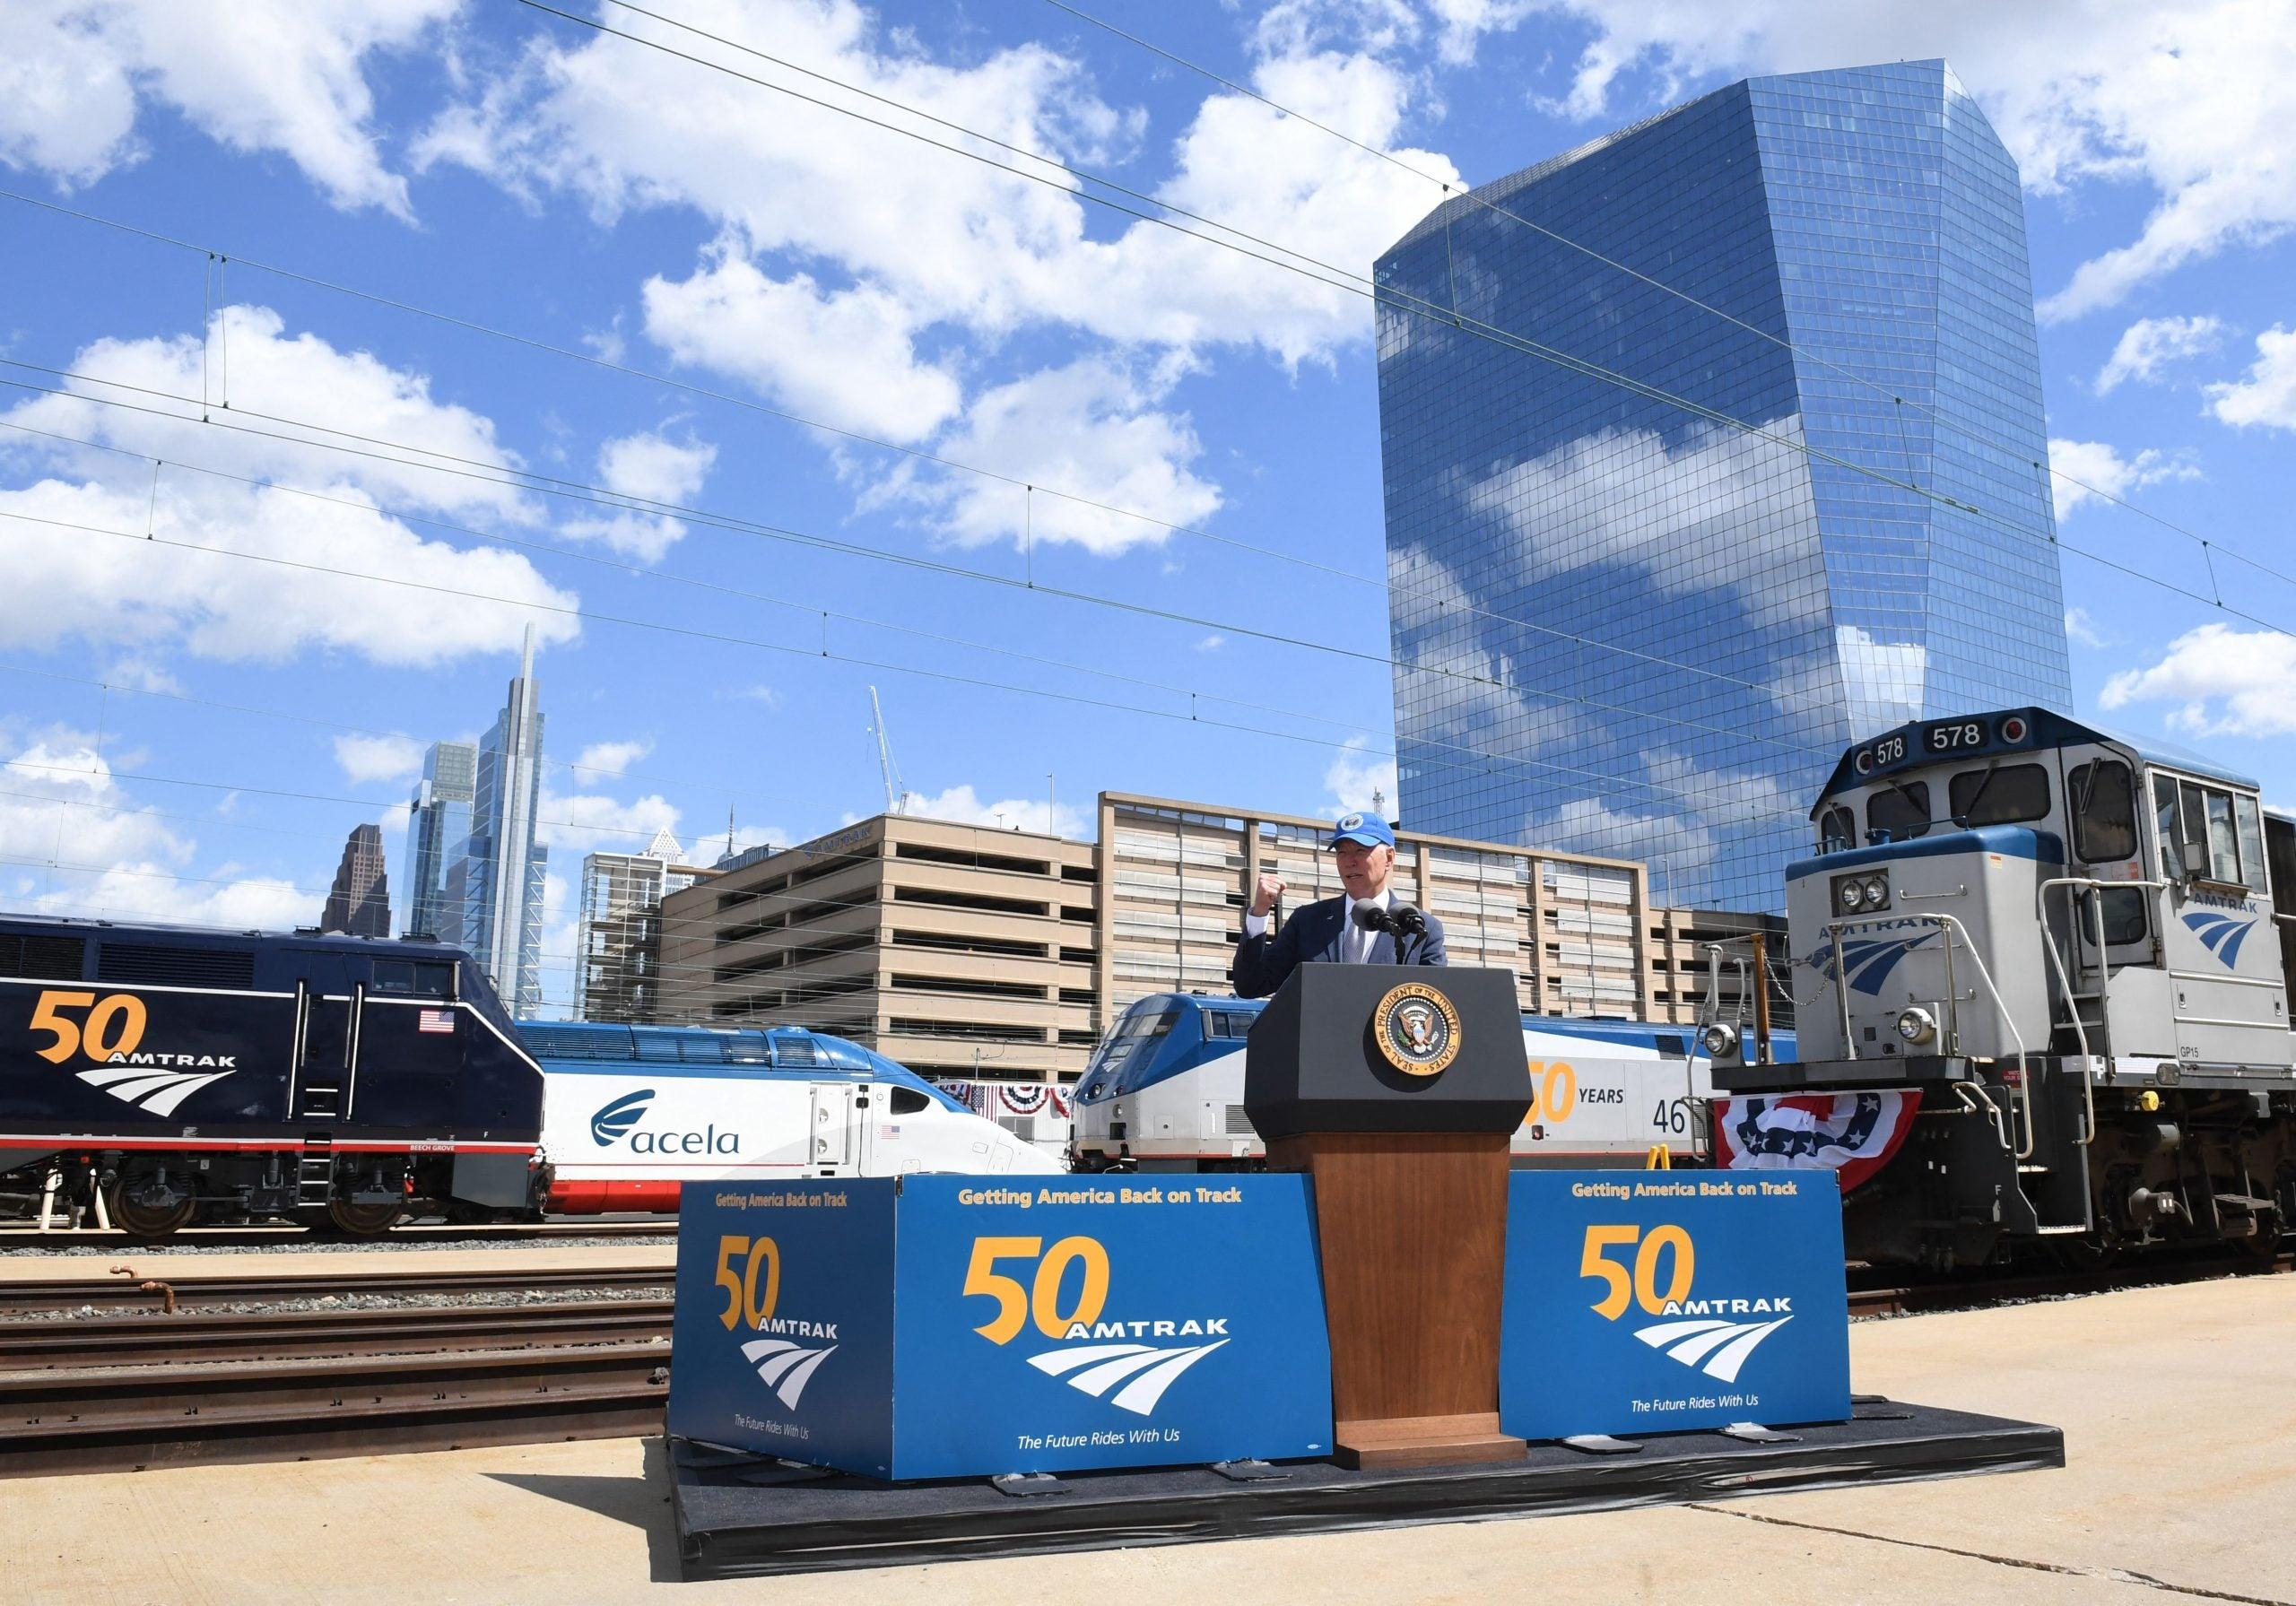 President Biden celebrates 50 years of Amtrak with $80 billion infrastructure push